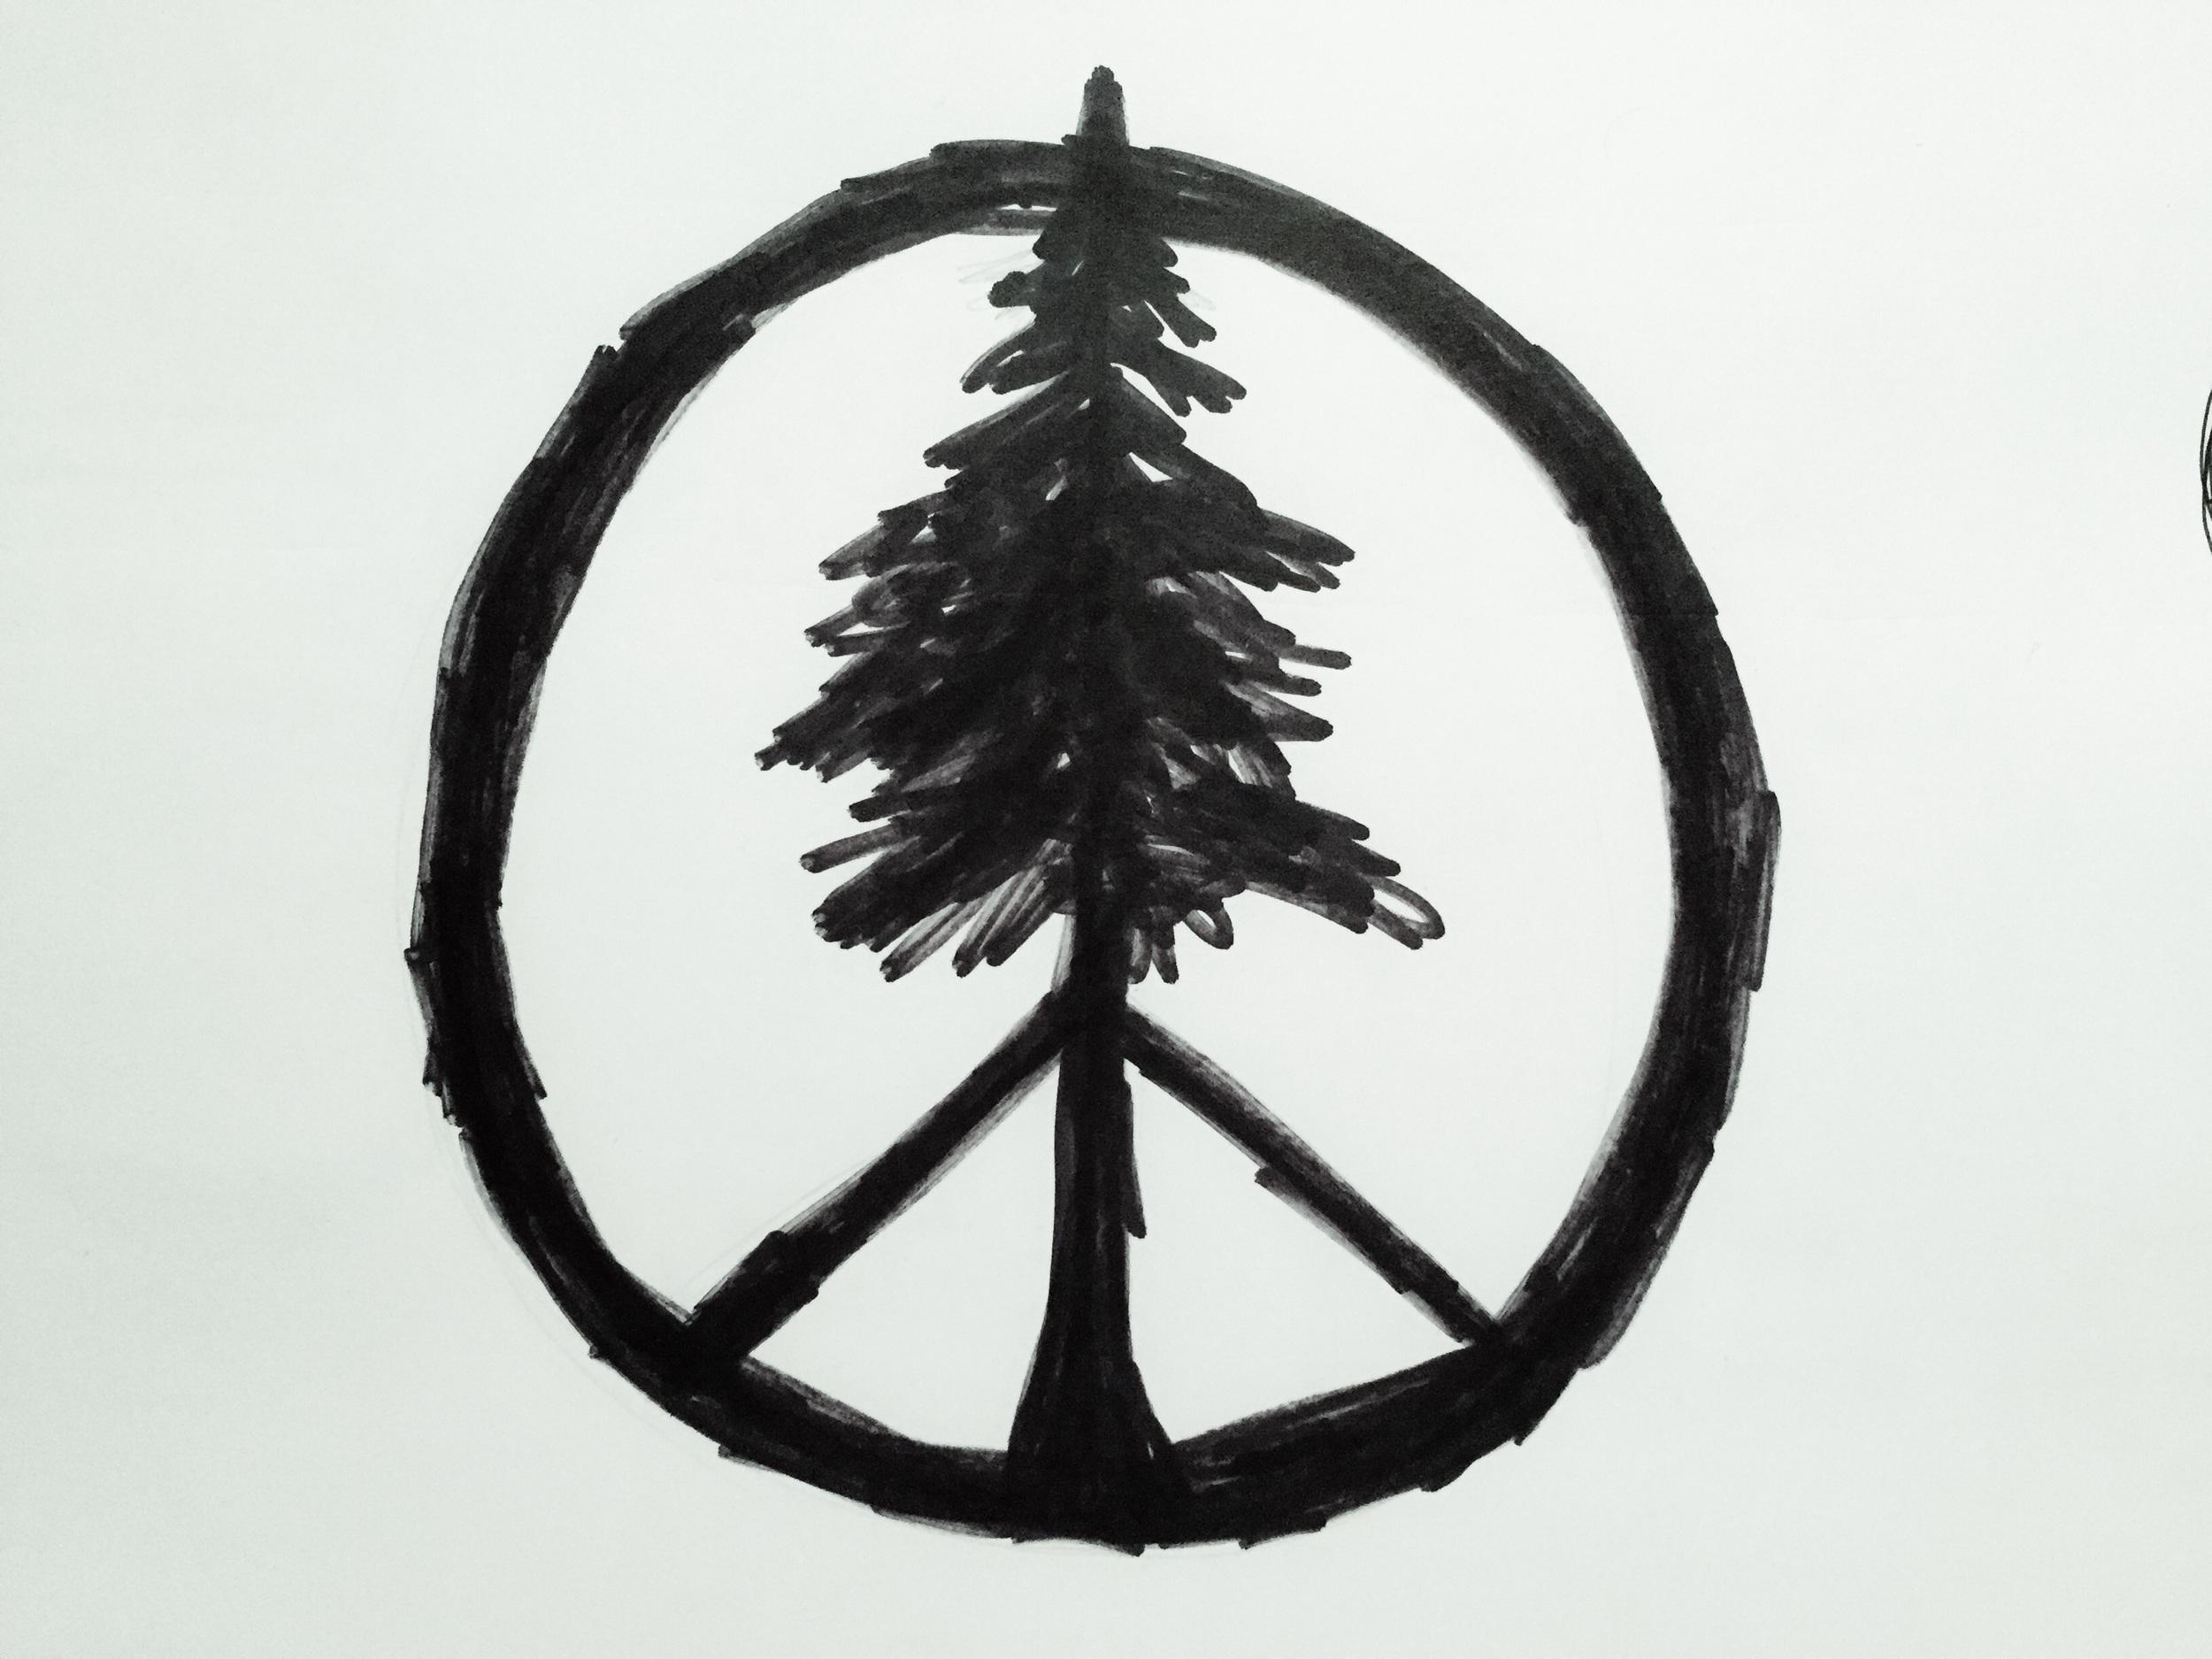 All lives are precious. #lebanonjetaime #lebanonattacks #parisjetaime #ParisAttacks